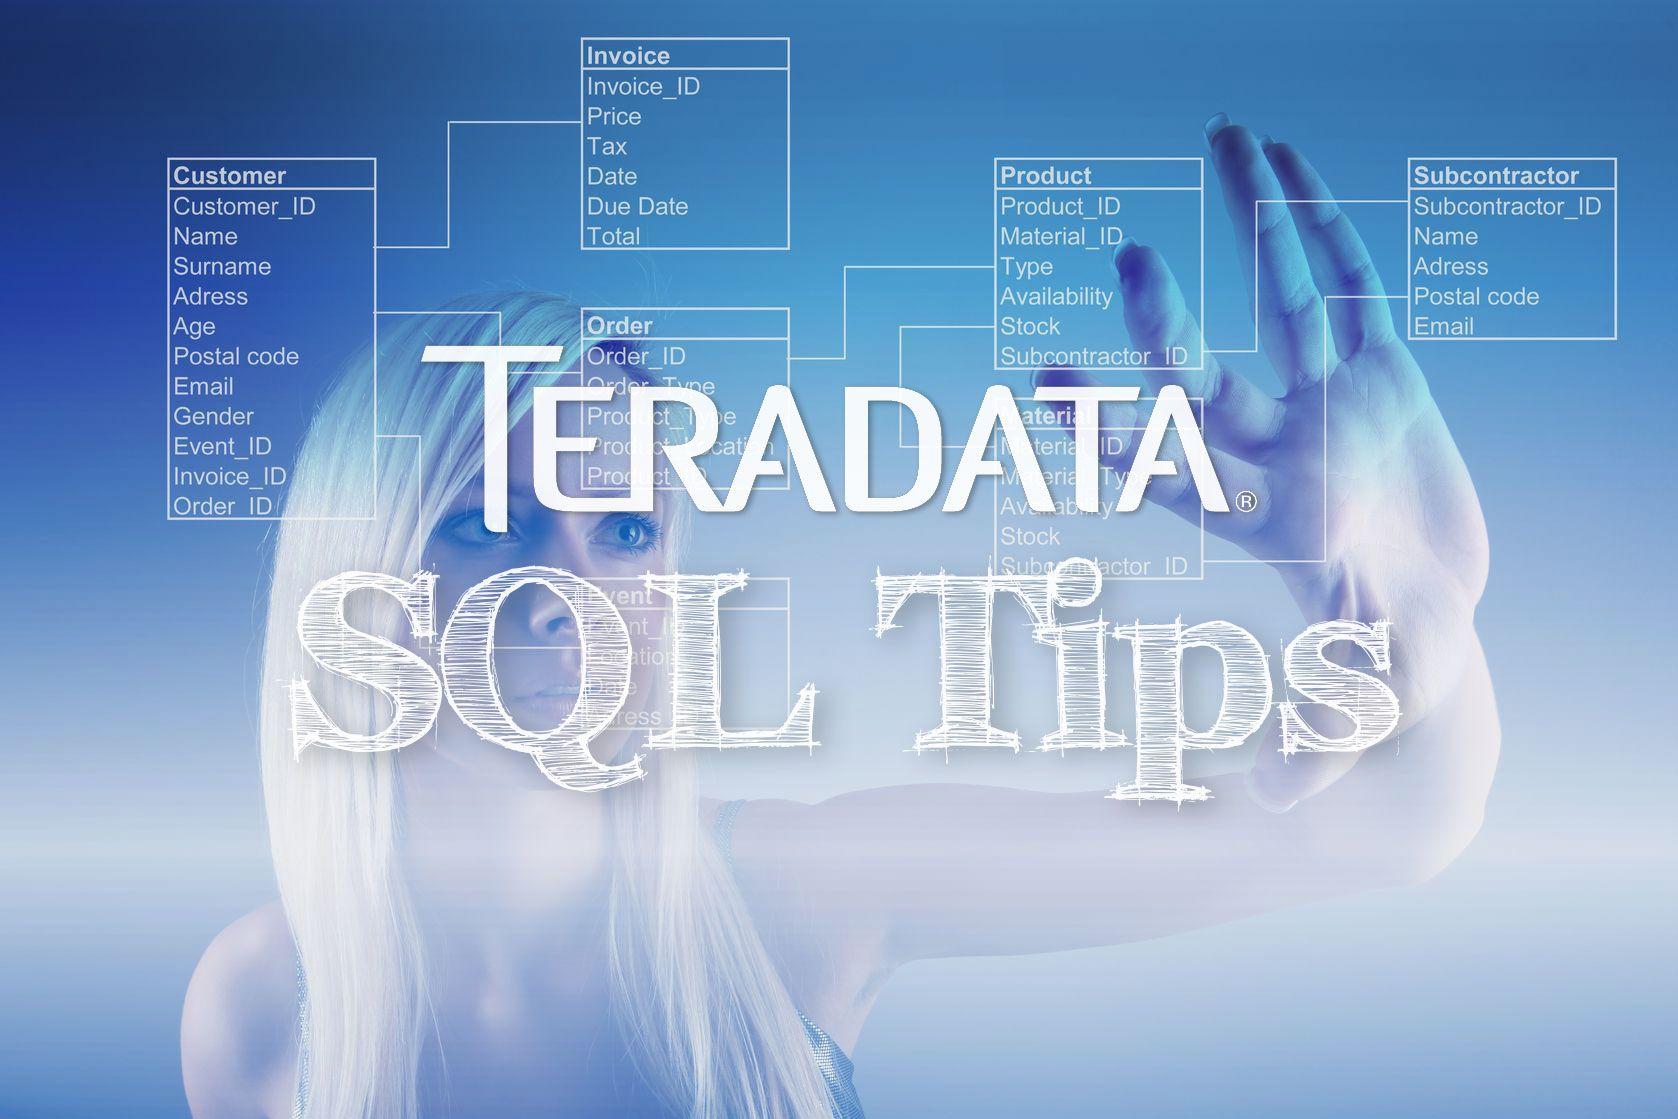 Using Teradata SQL: Finding a person's age